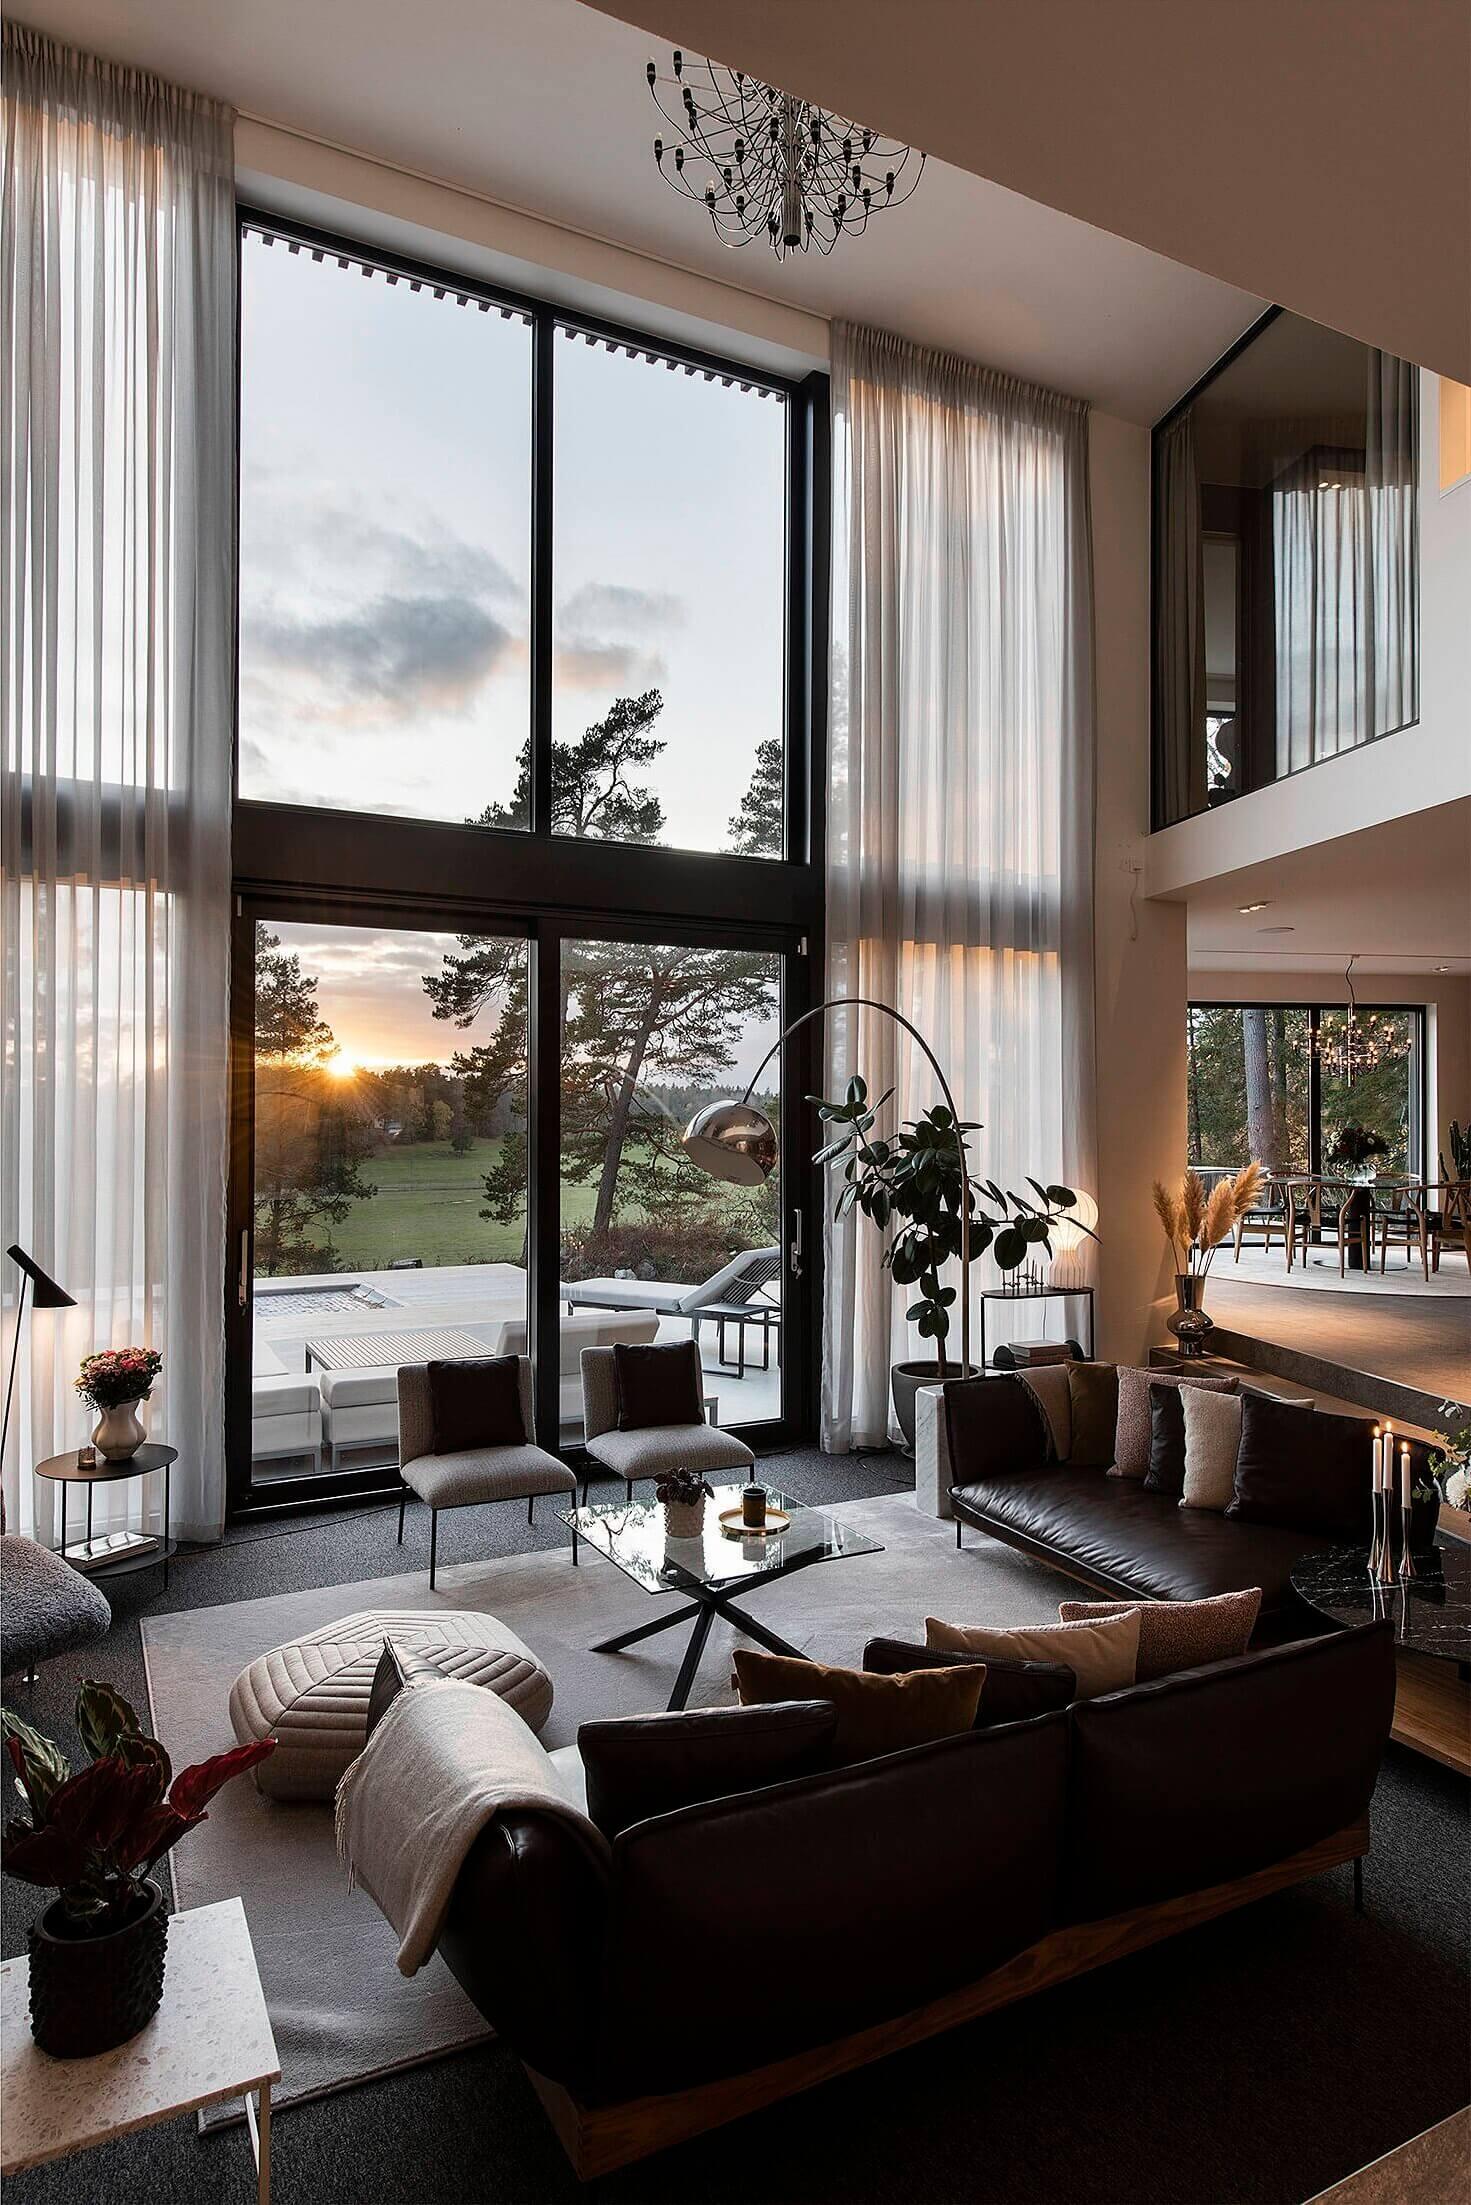 A Luxurious Open Plan Architectural Villa in Sweden